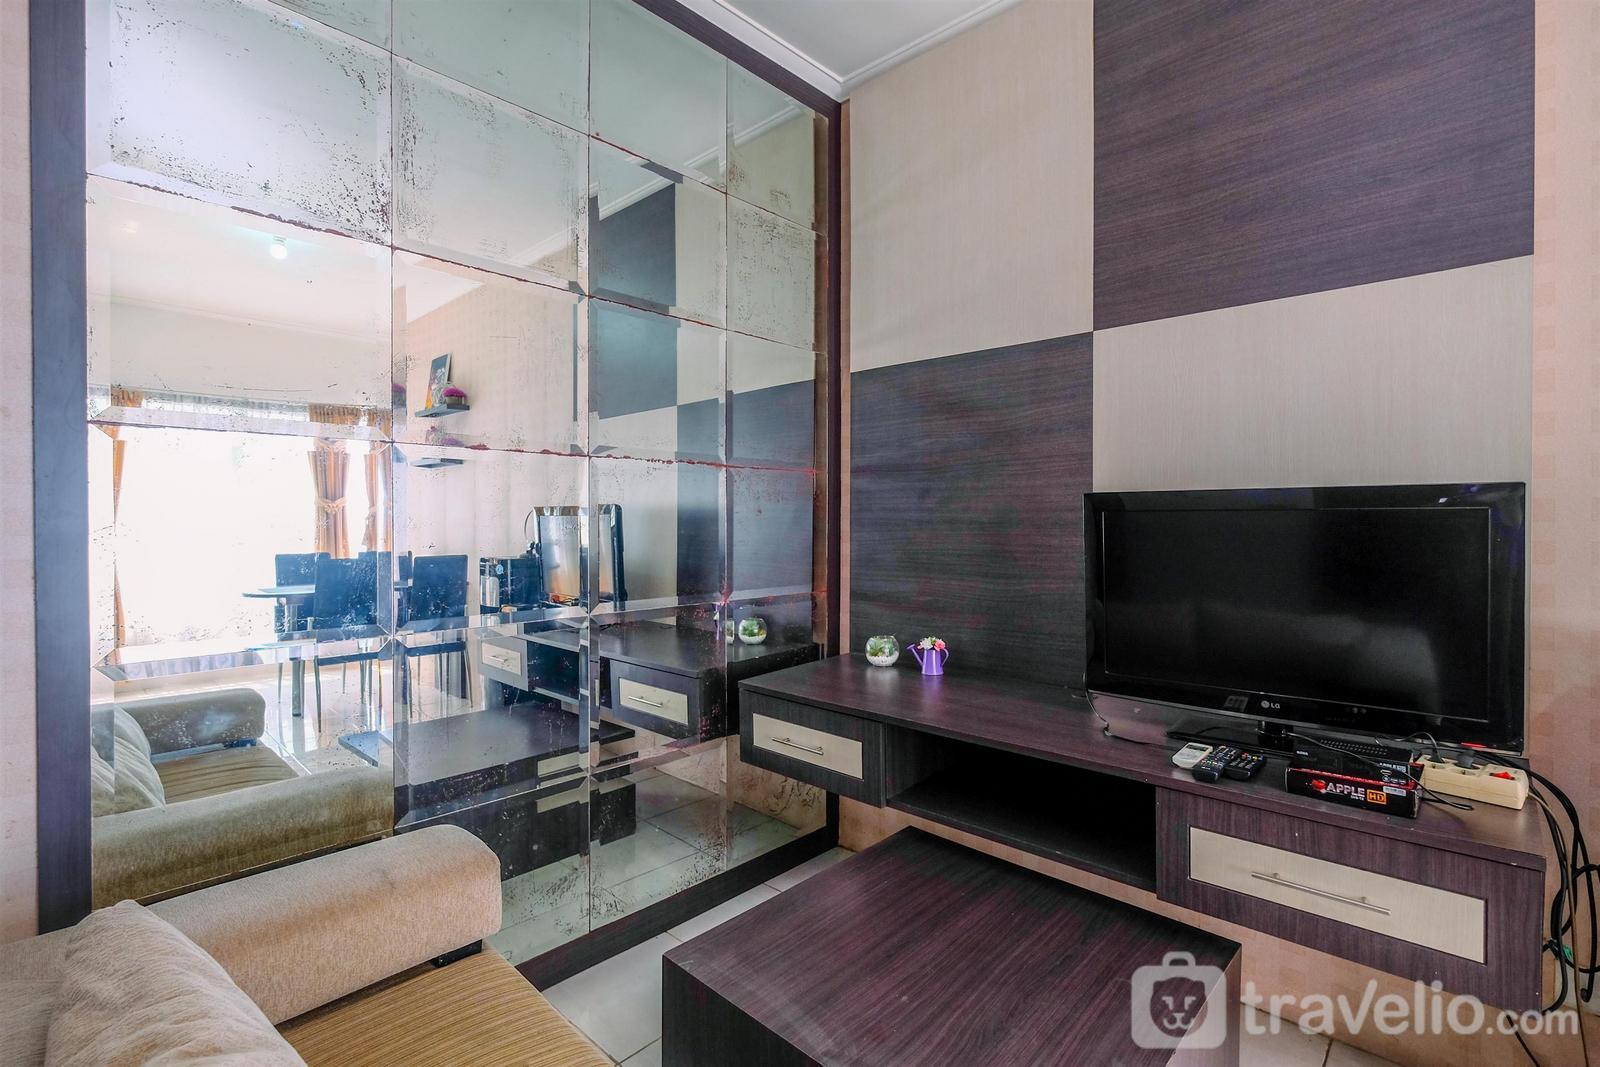 Apartemen Sudirman Park - Good Choice for 2BR at Sudirman Park Apartment By Travelio